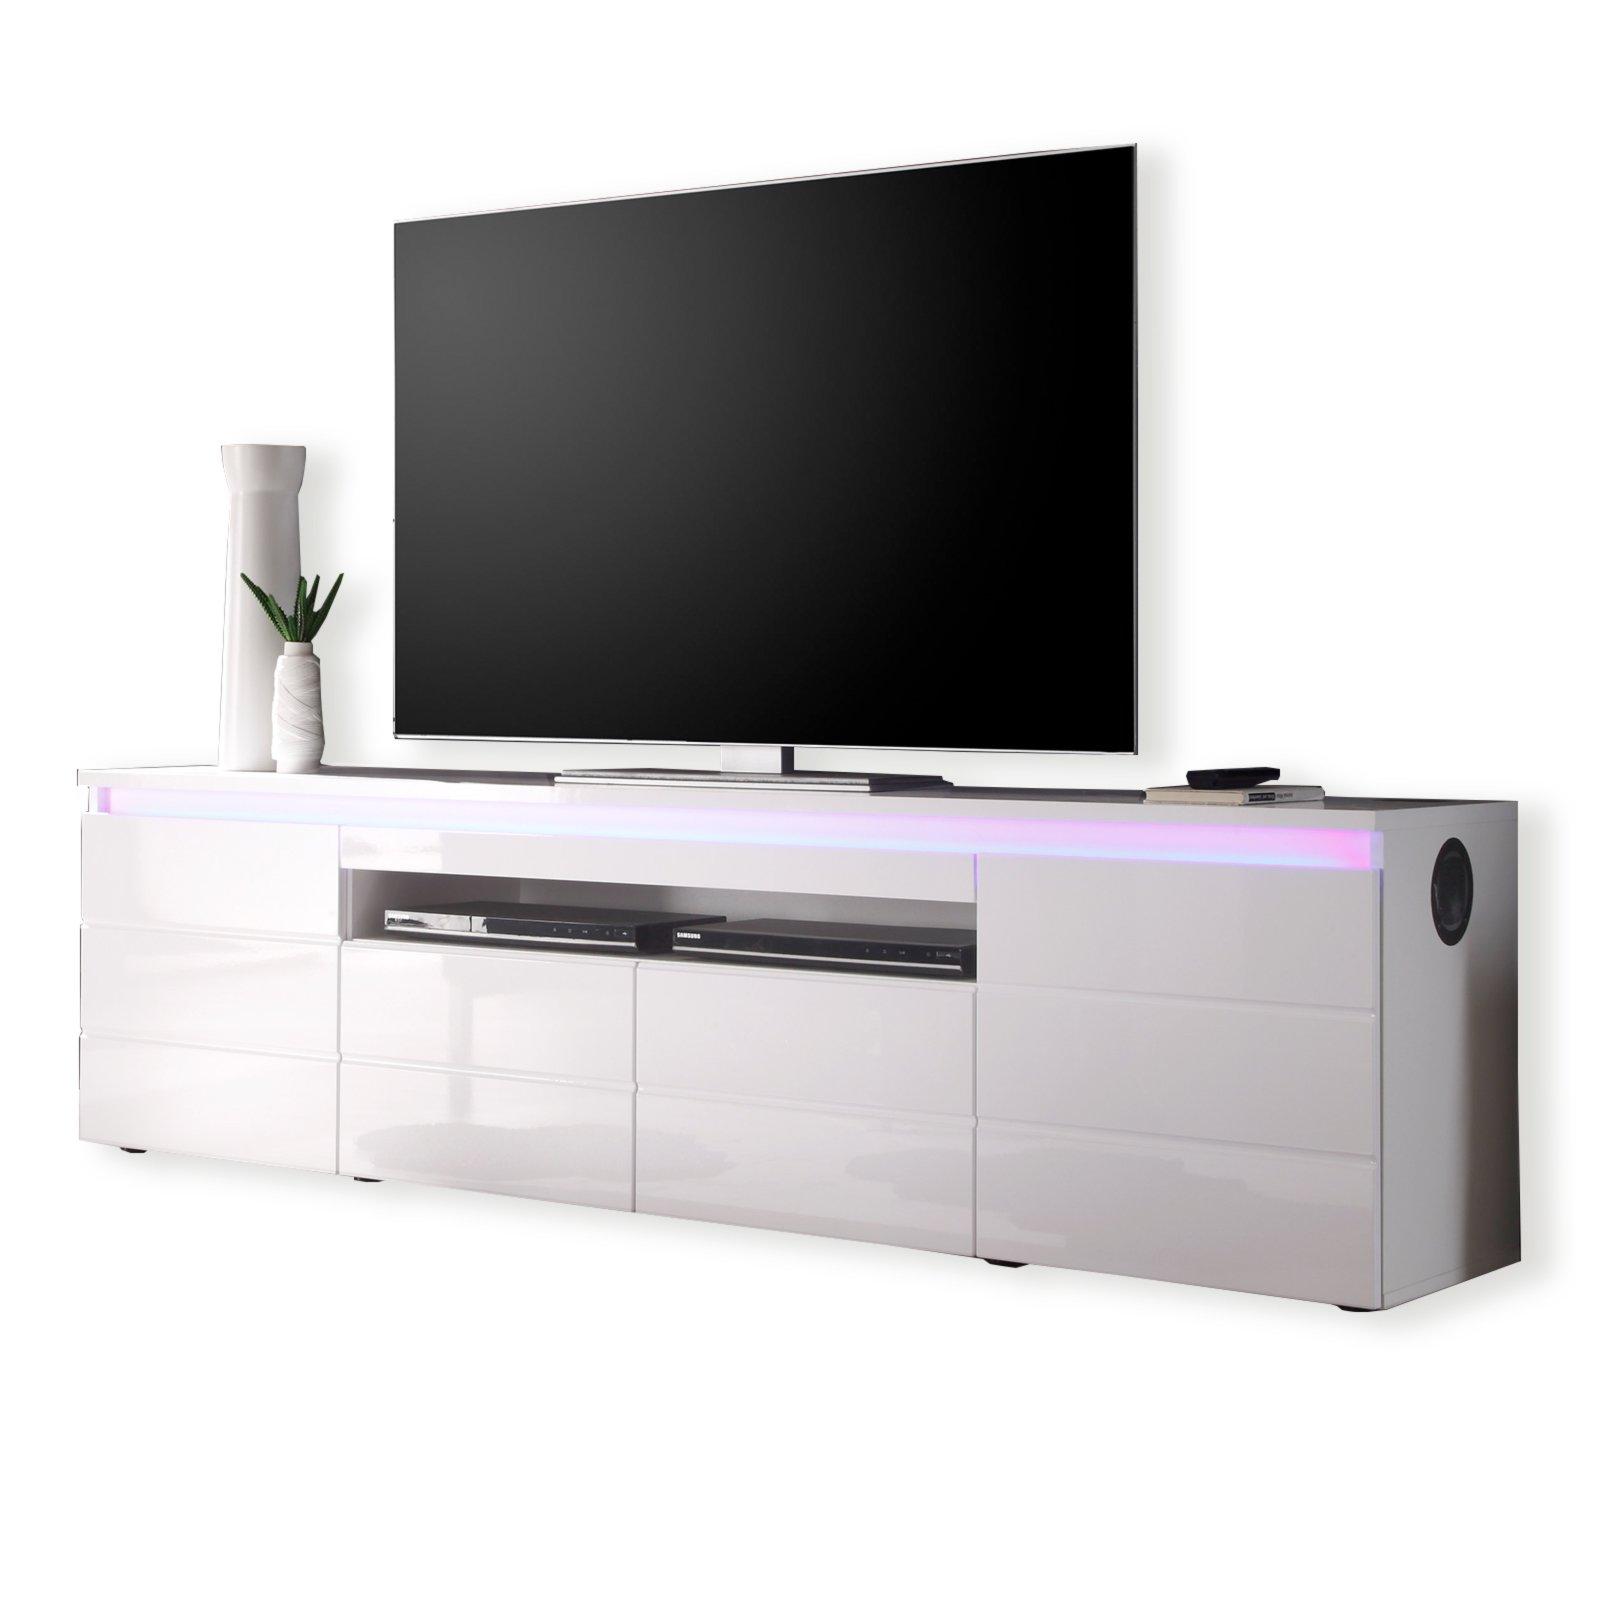 lowboard wei beleuchtung inspirierendes design f r wohnm bel. Black Bedroom Furniture Sets. Home Design Ideas